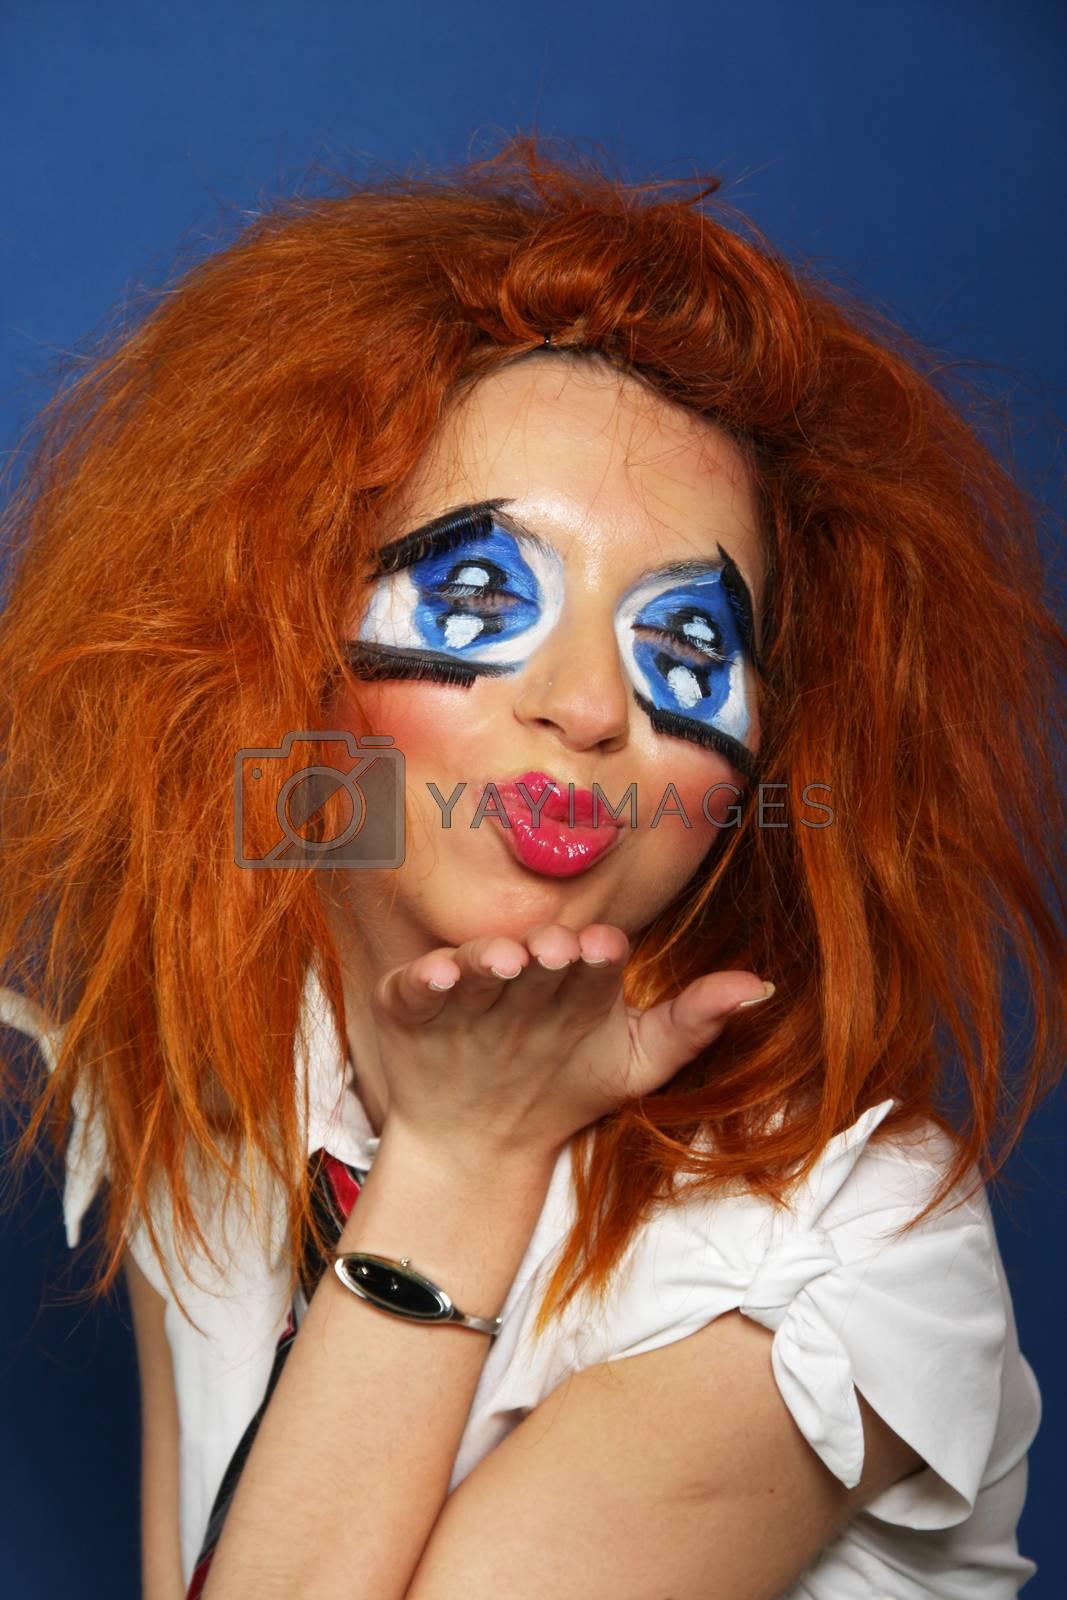 Sexy girl with strange make-up